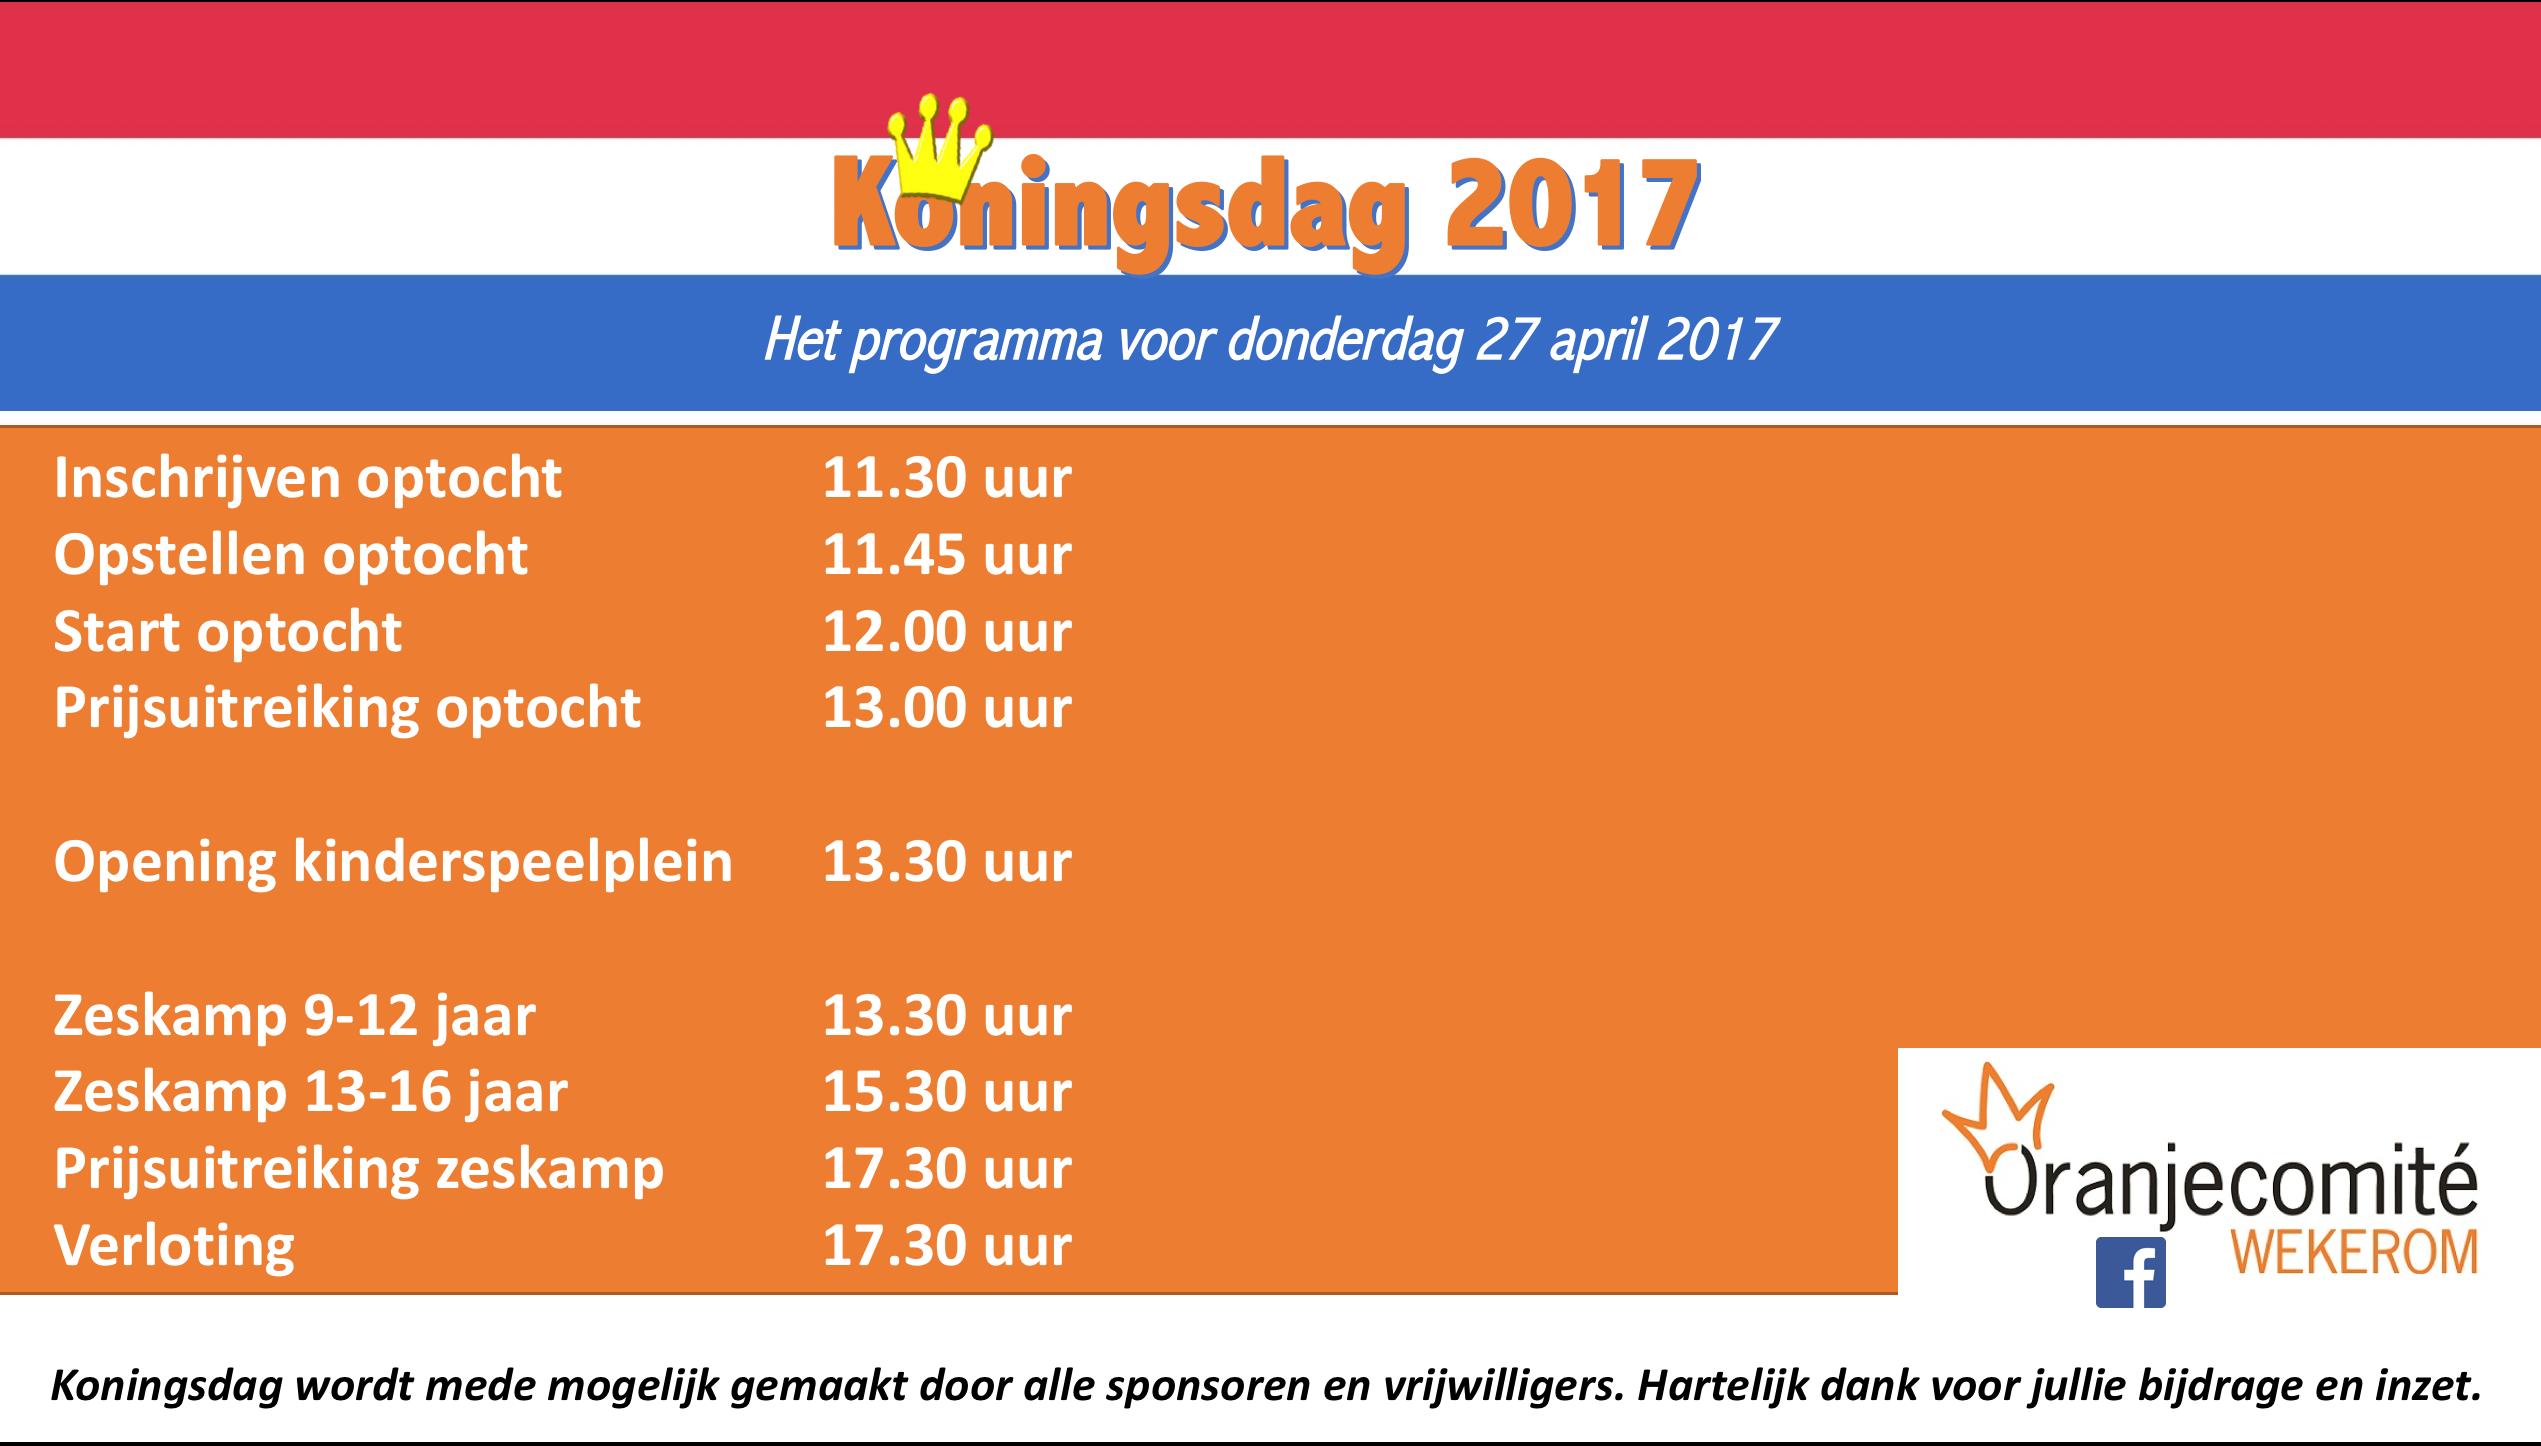 OC2017_Programma2017